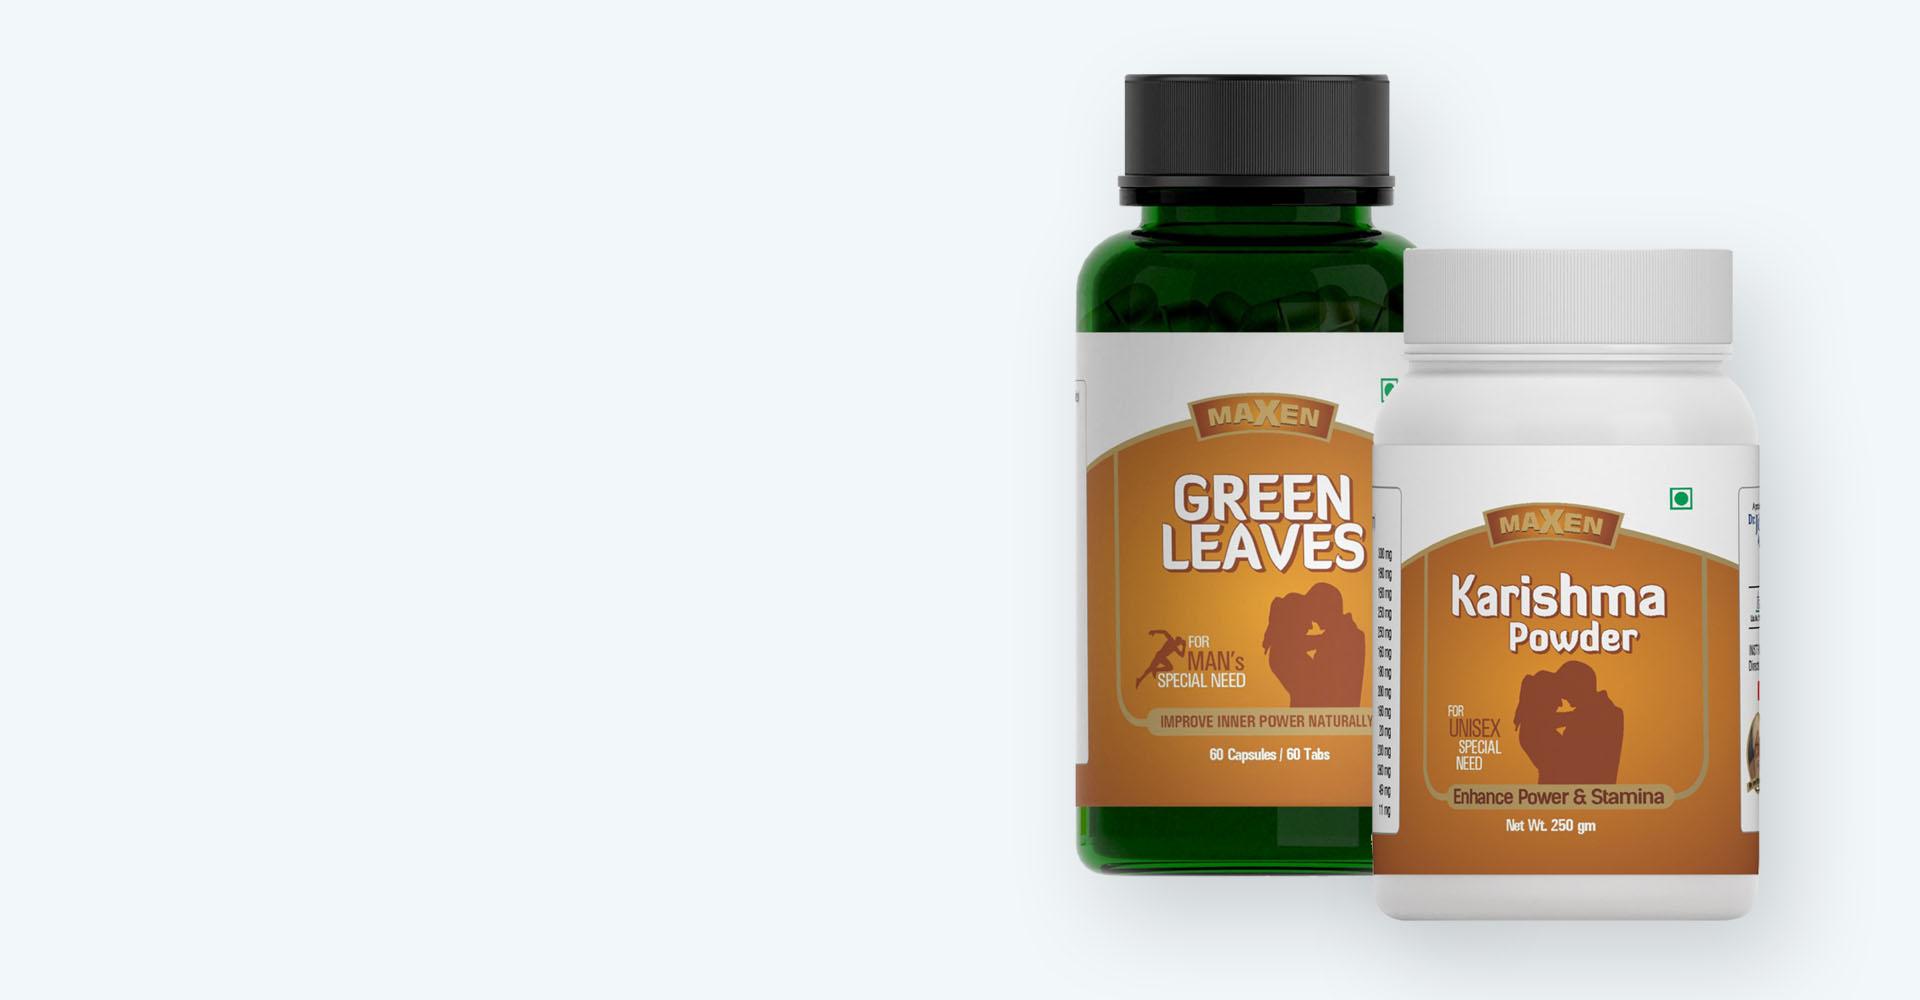 Green Leaves and <br> Karishma Powder